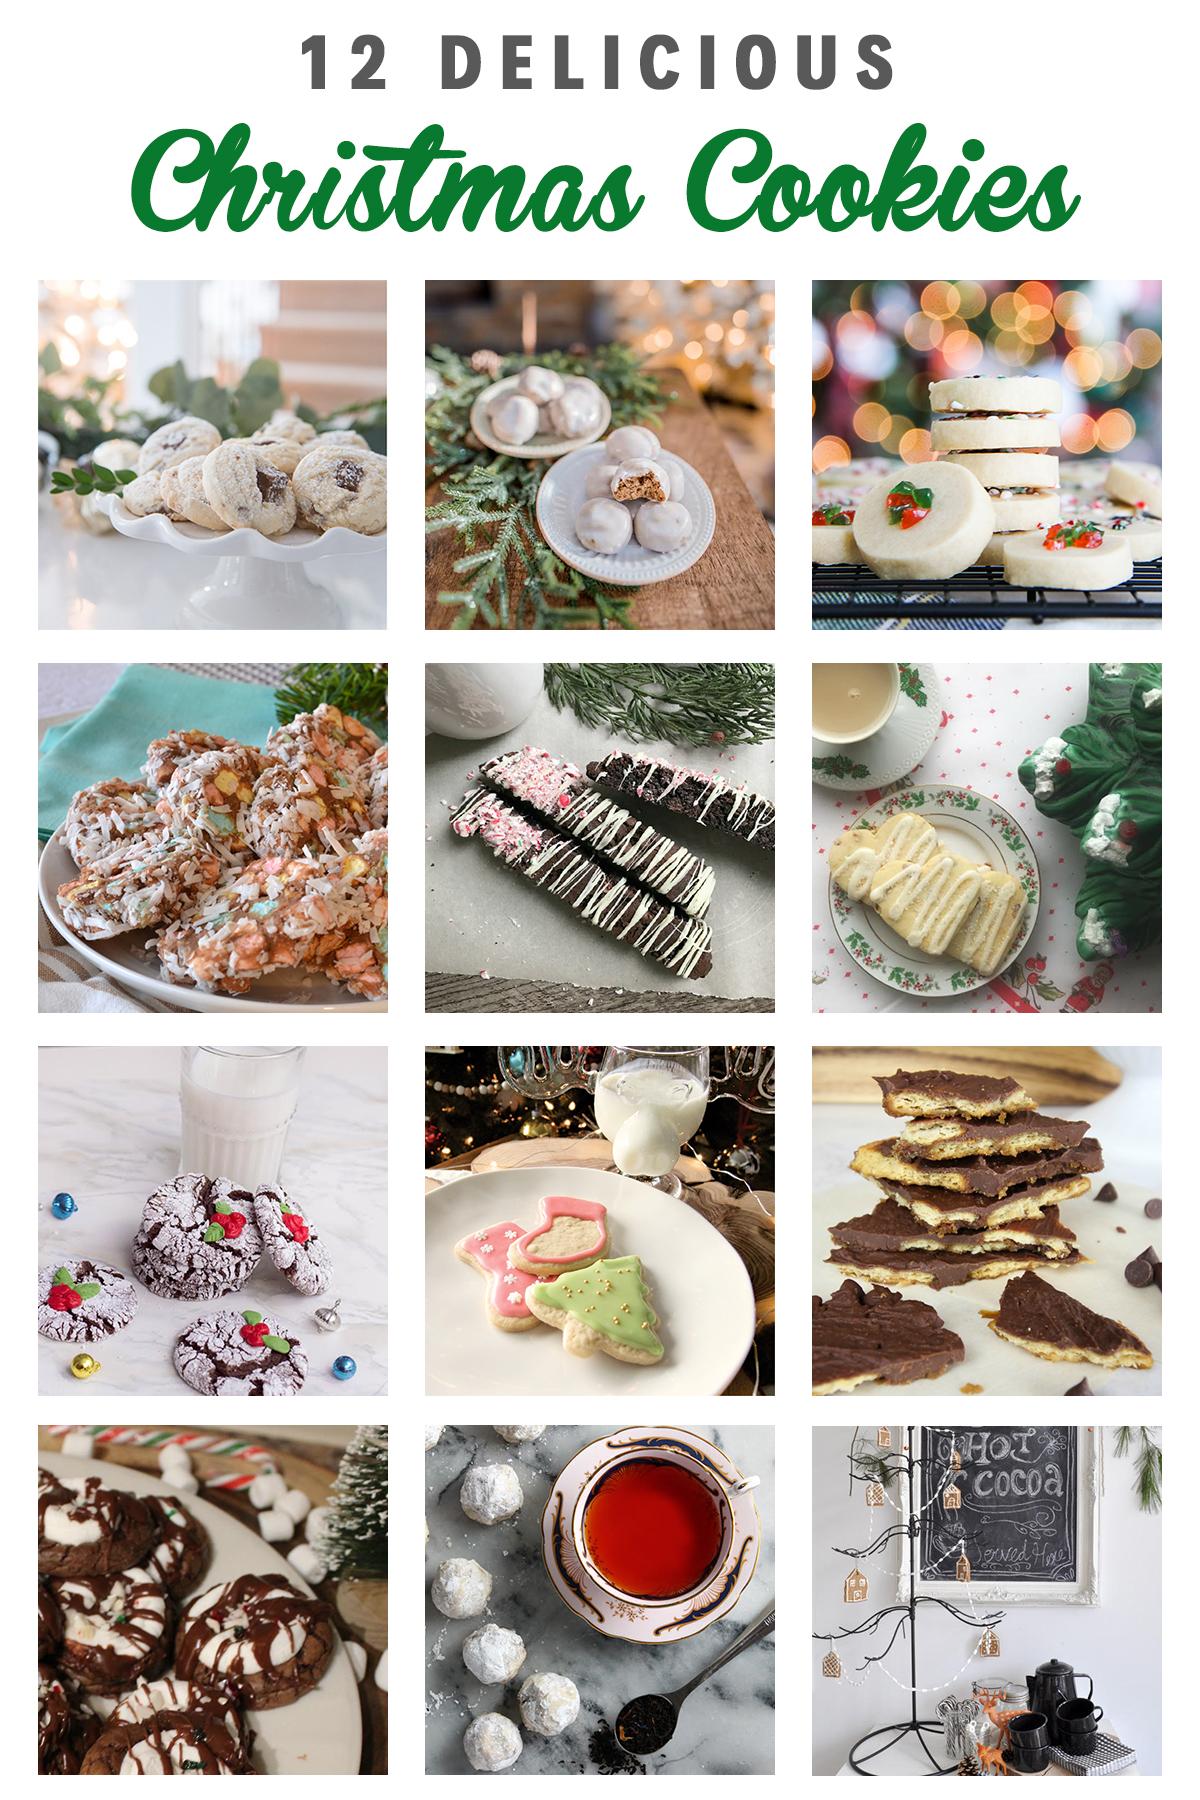 12 Delicious Christmas Cookies Including Ritz Cracker Bark!